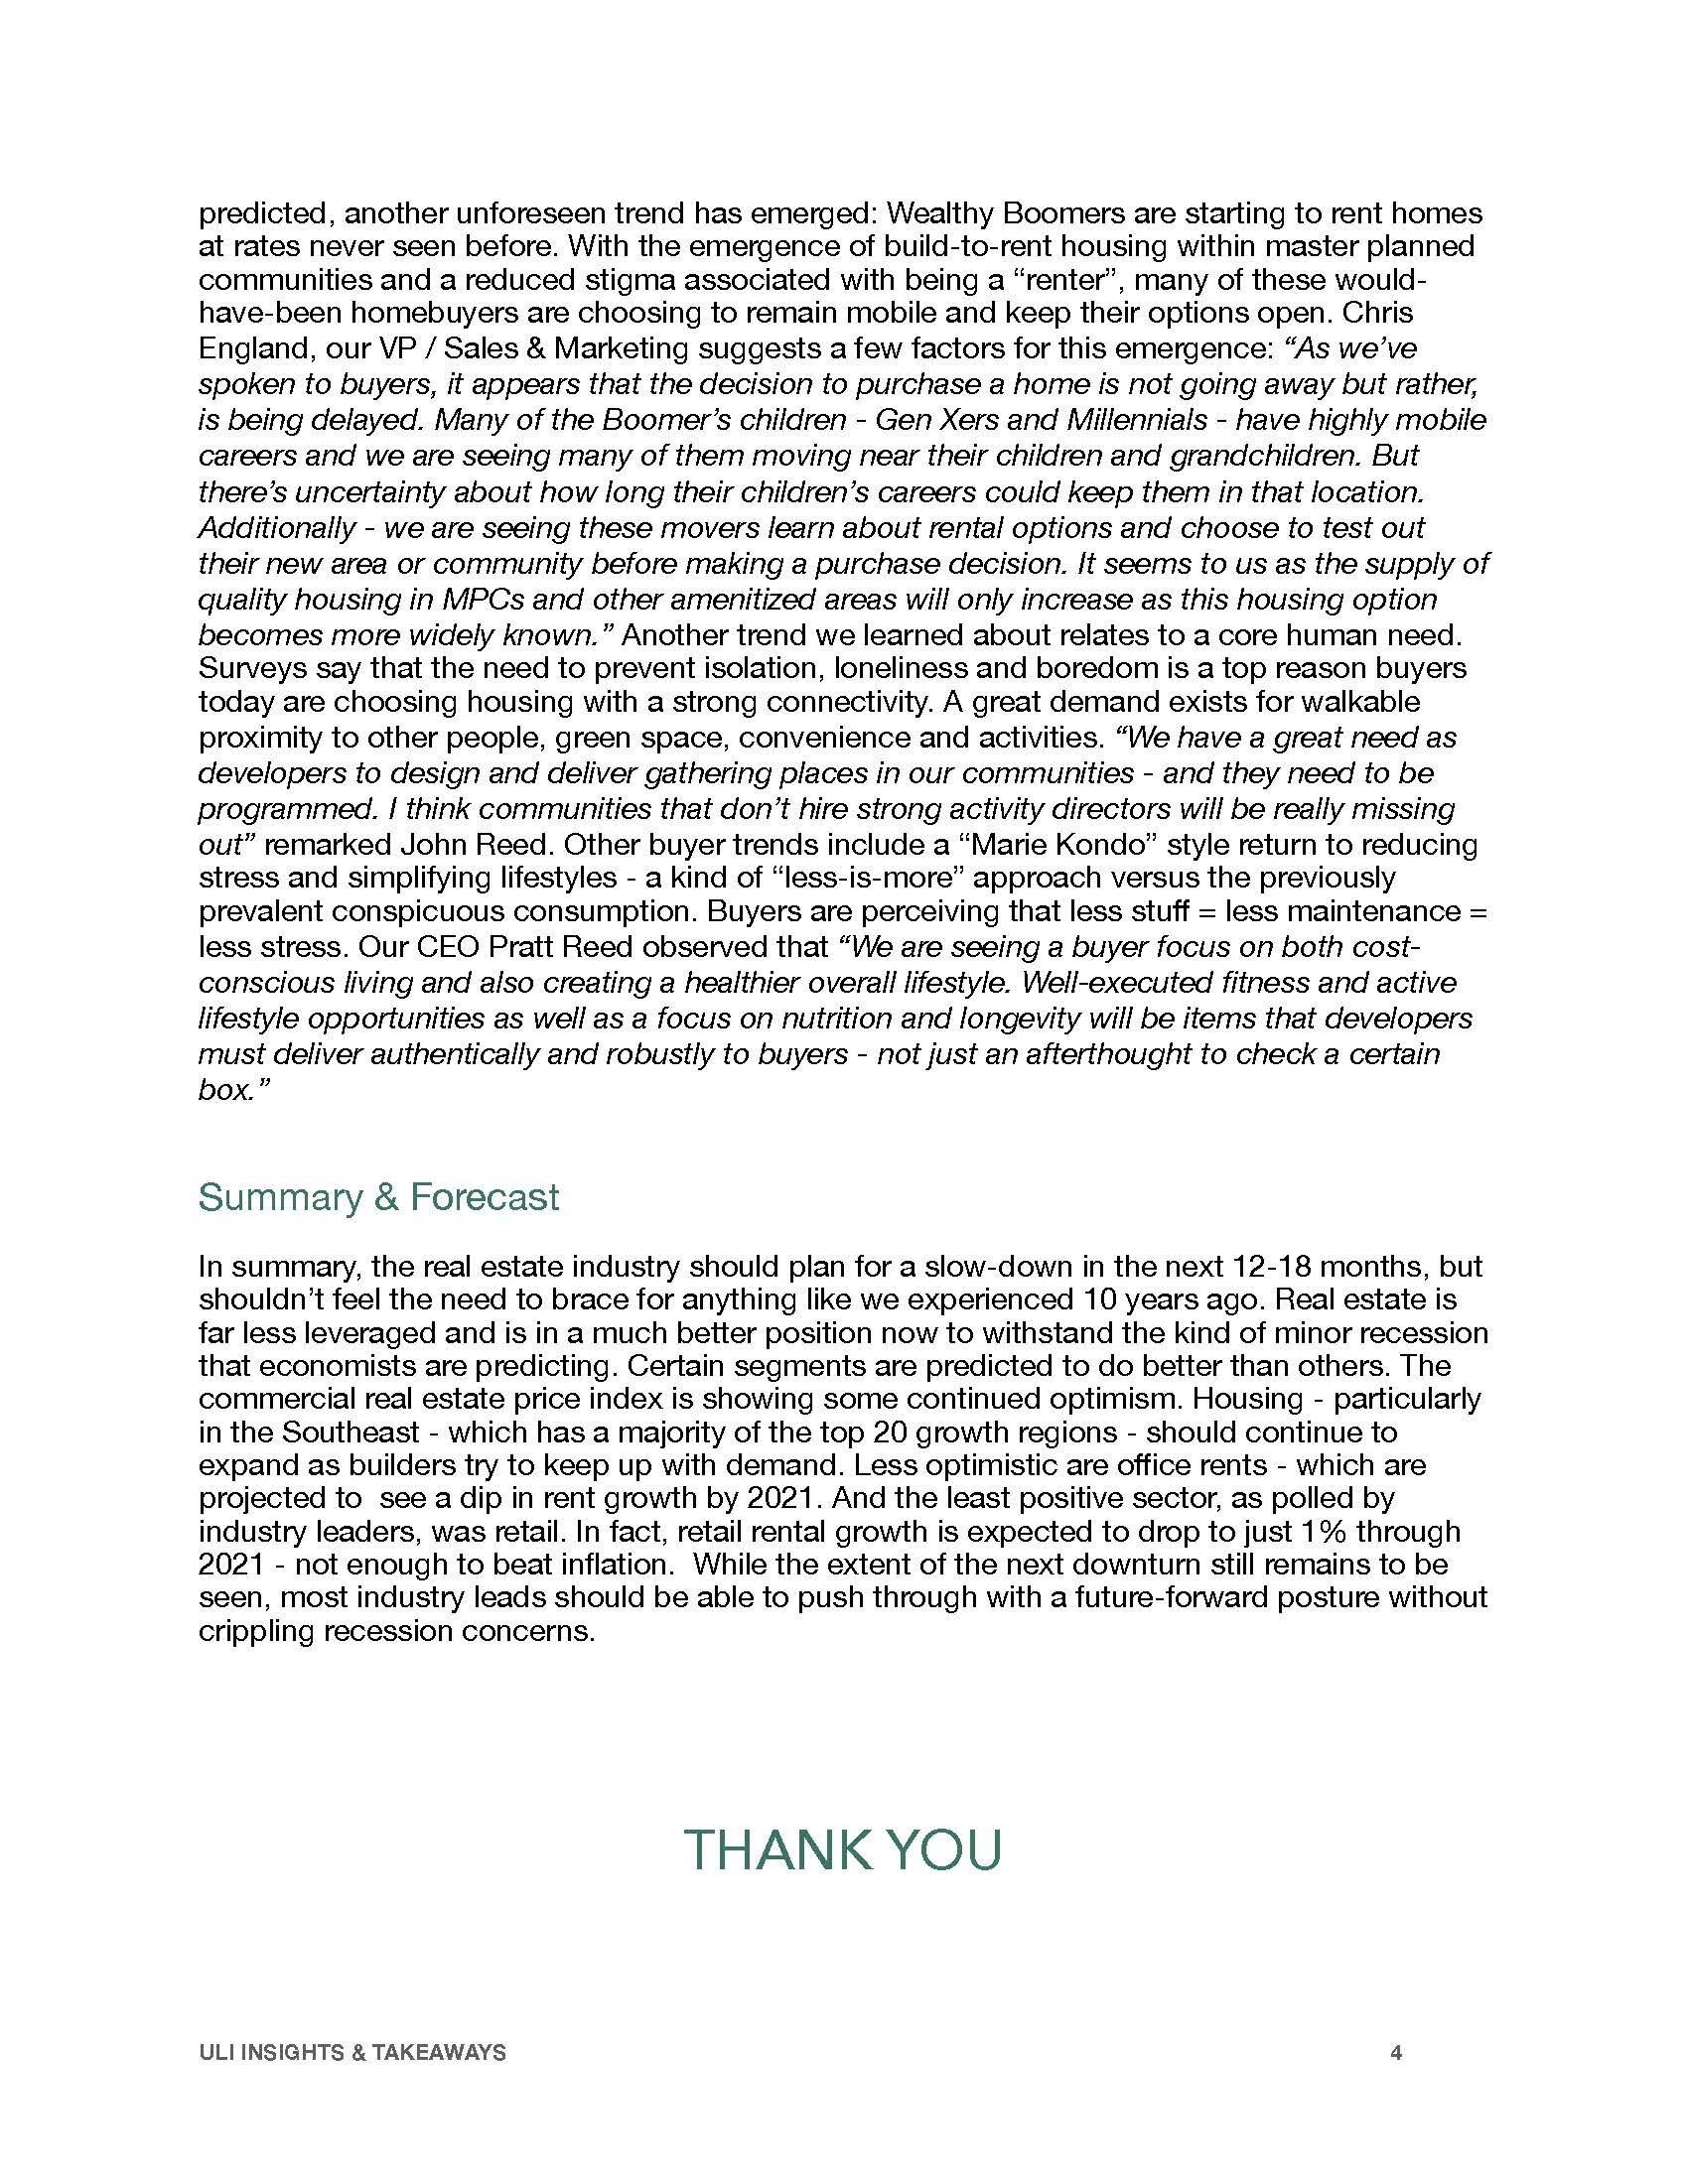 Reed Group - ULI INSIGHTS Fall 19 Final_Page_4.jpg